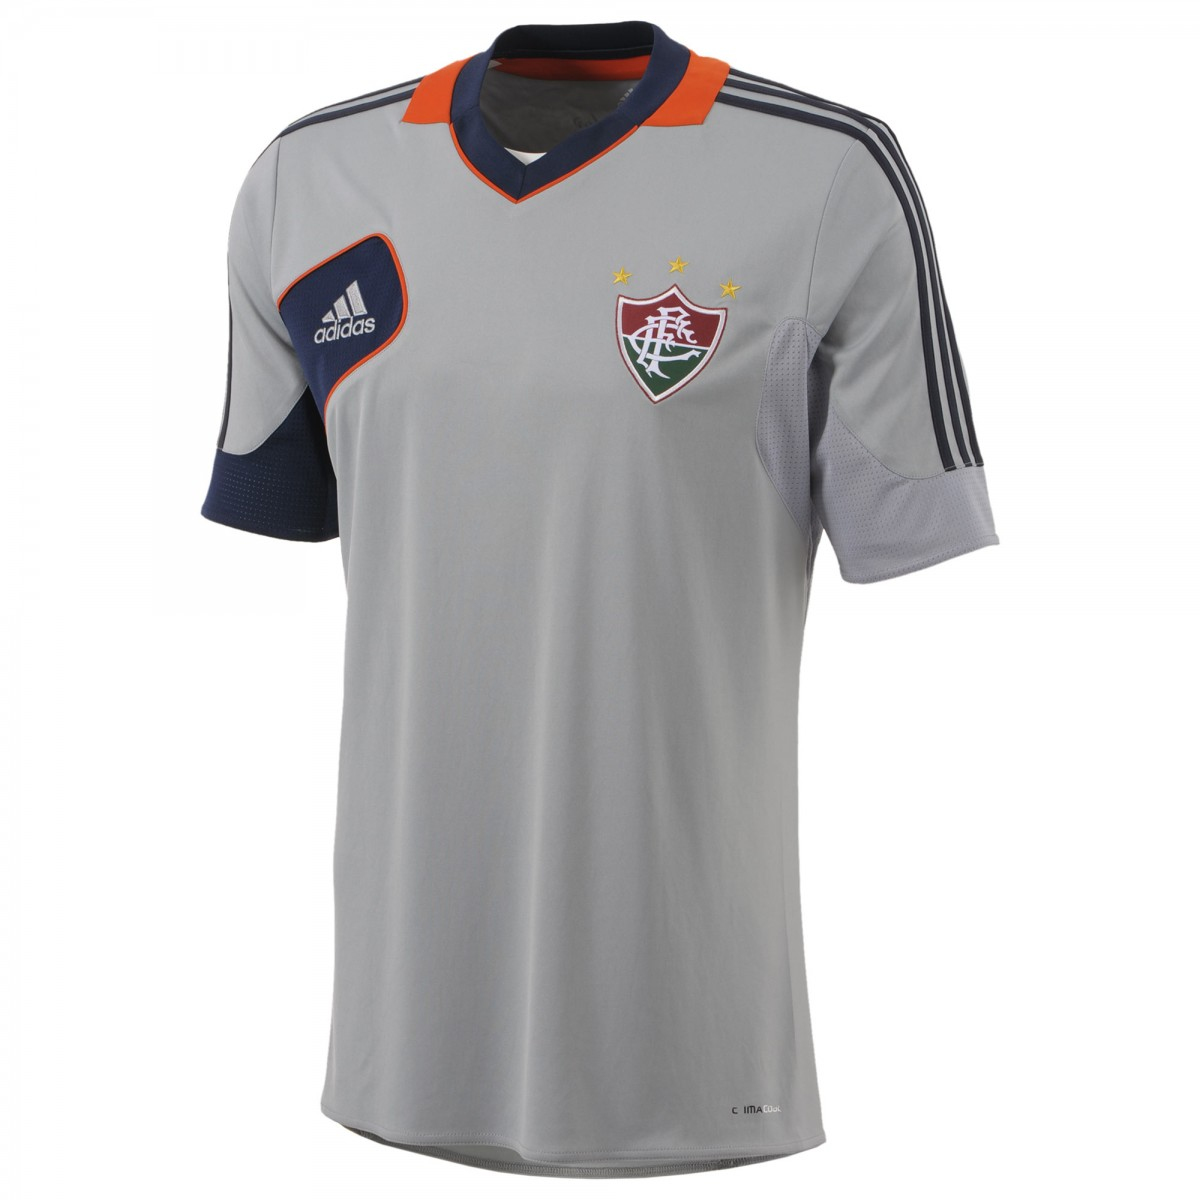 Camiseta Adidas Treino Fluminense I  98c152306a9